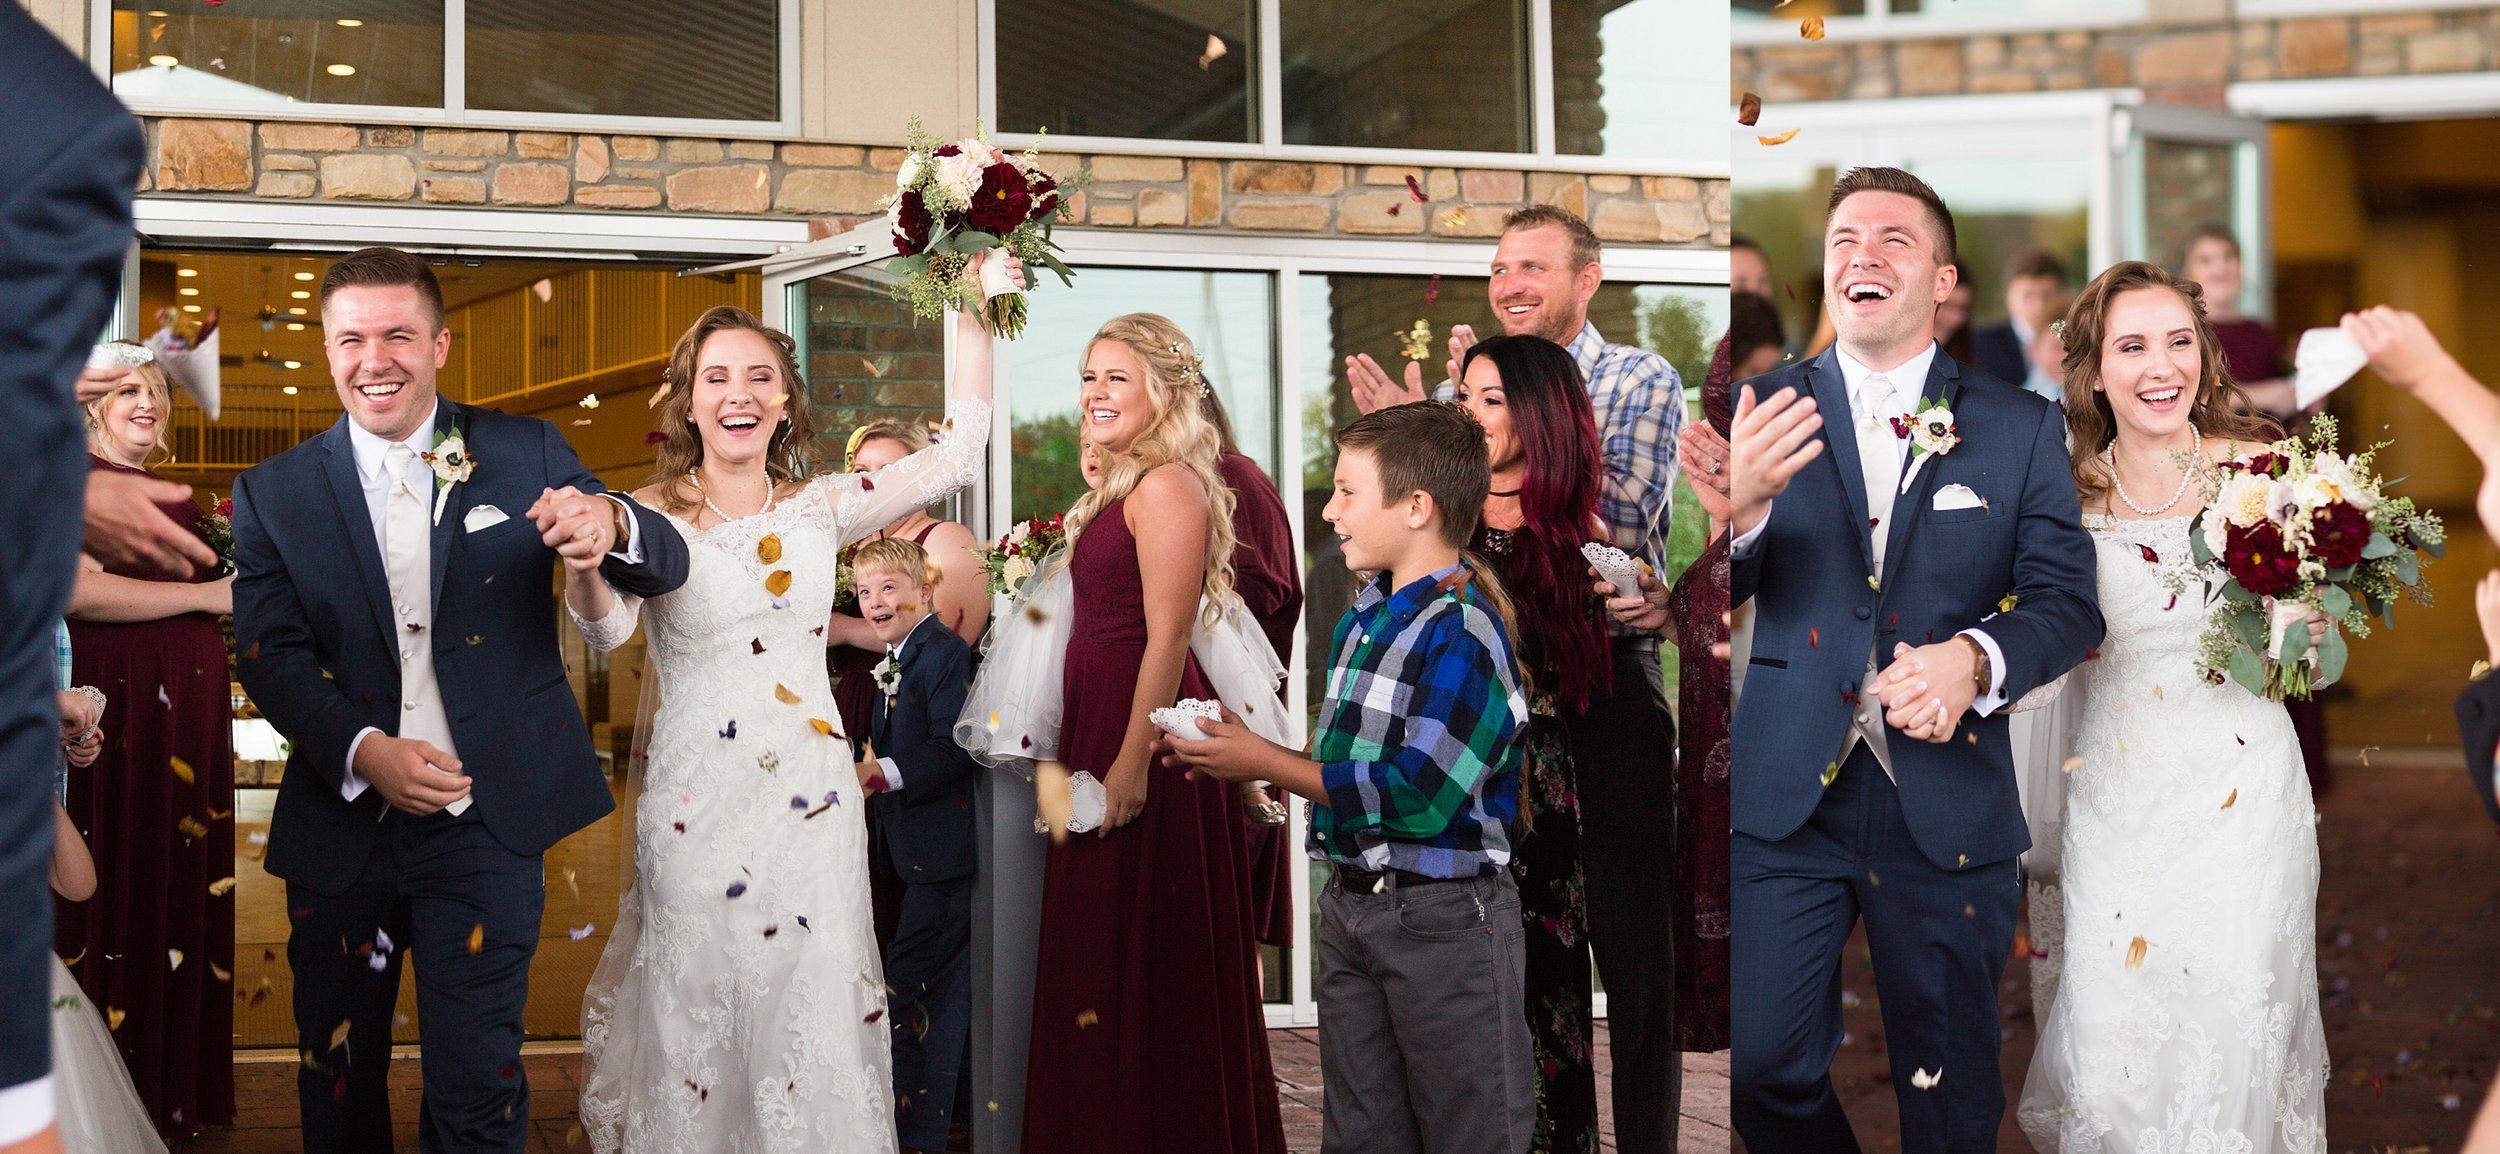 Komorebi Photography -Oklahoma City Wedding Photographer